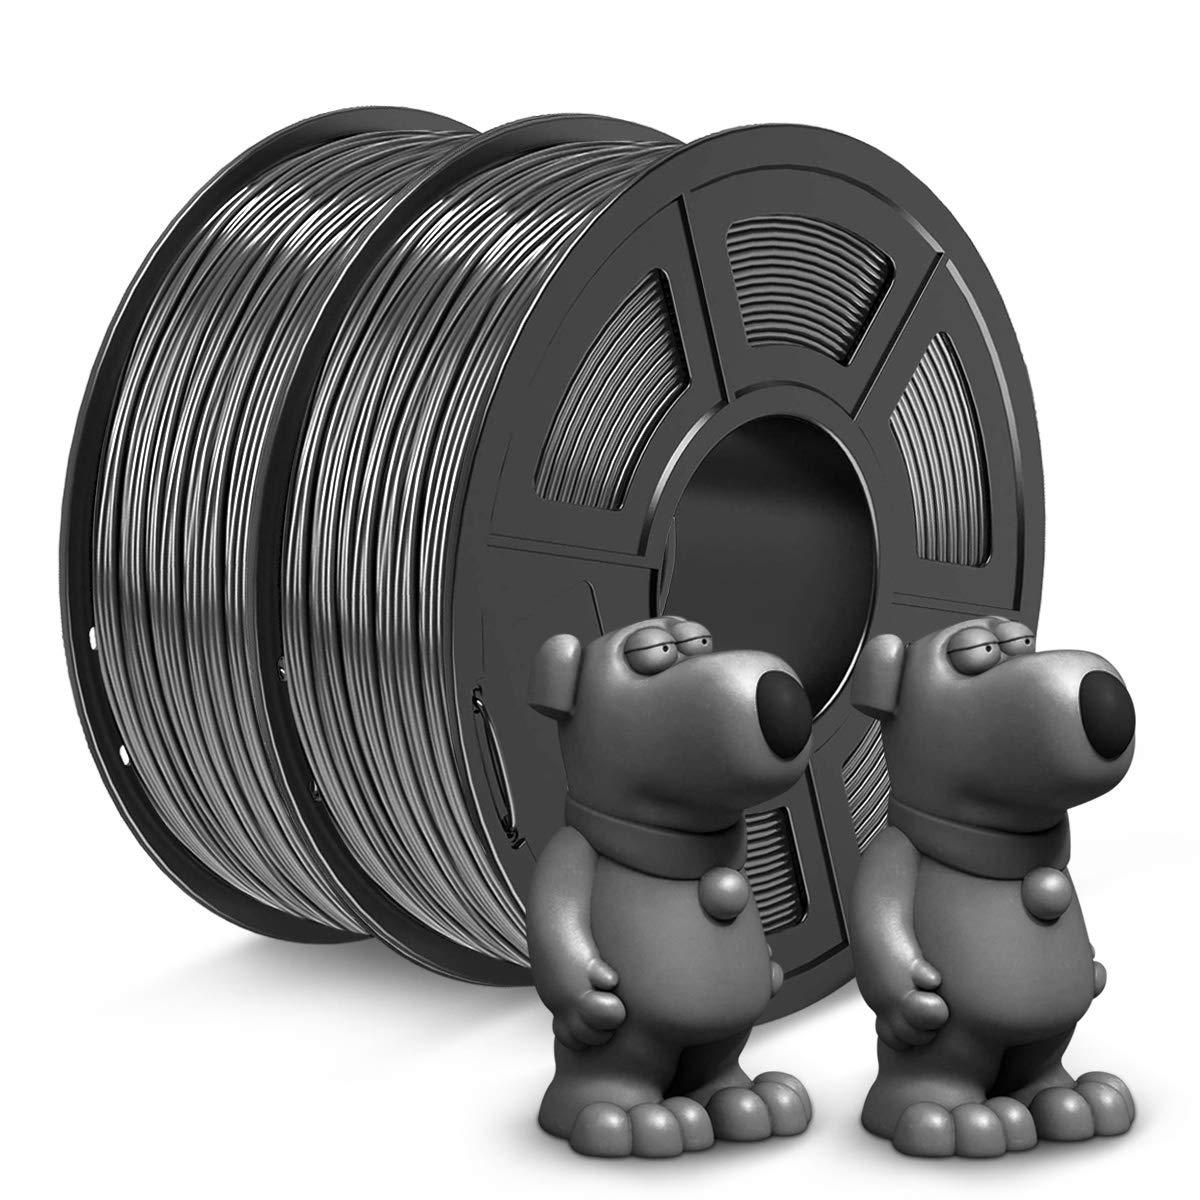 JAYO ABS Filament Same day shipping 1.75mm 2kg Tulsa Mall 3D 4.4lbs Fila Spool Printer